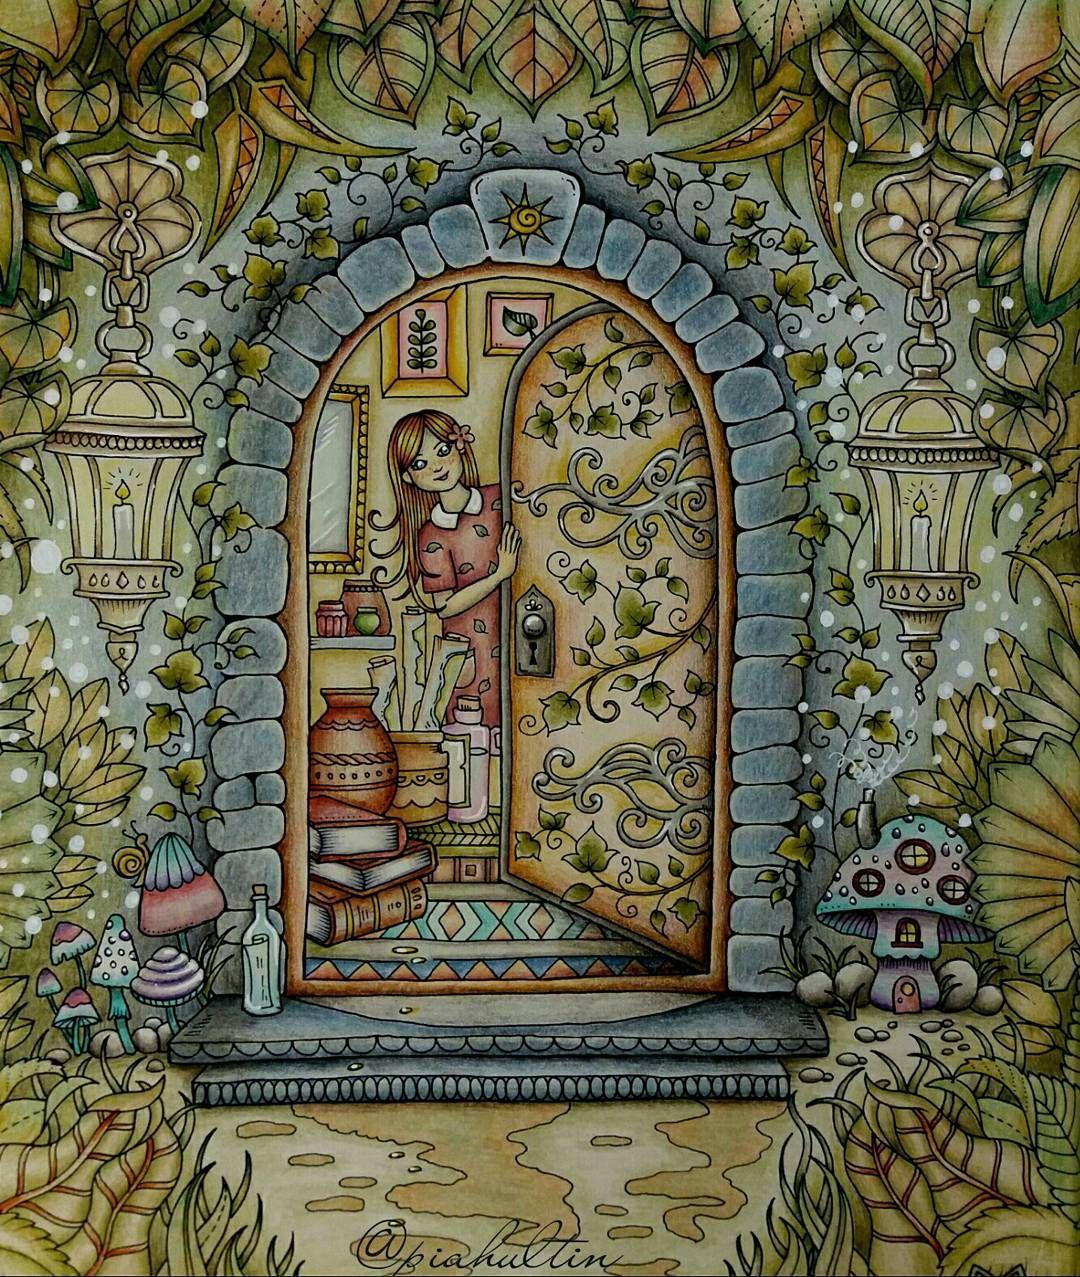 Pin by Debra Gidel on Coloring | Pinterest | Butterfly, Johanna ...